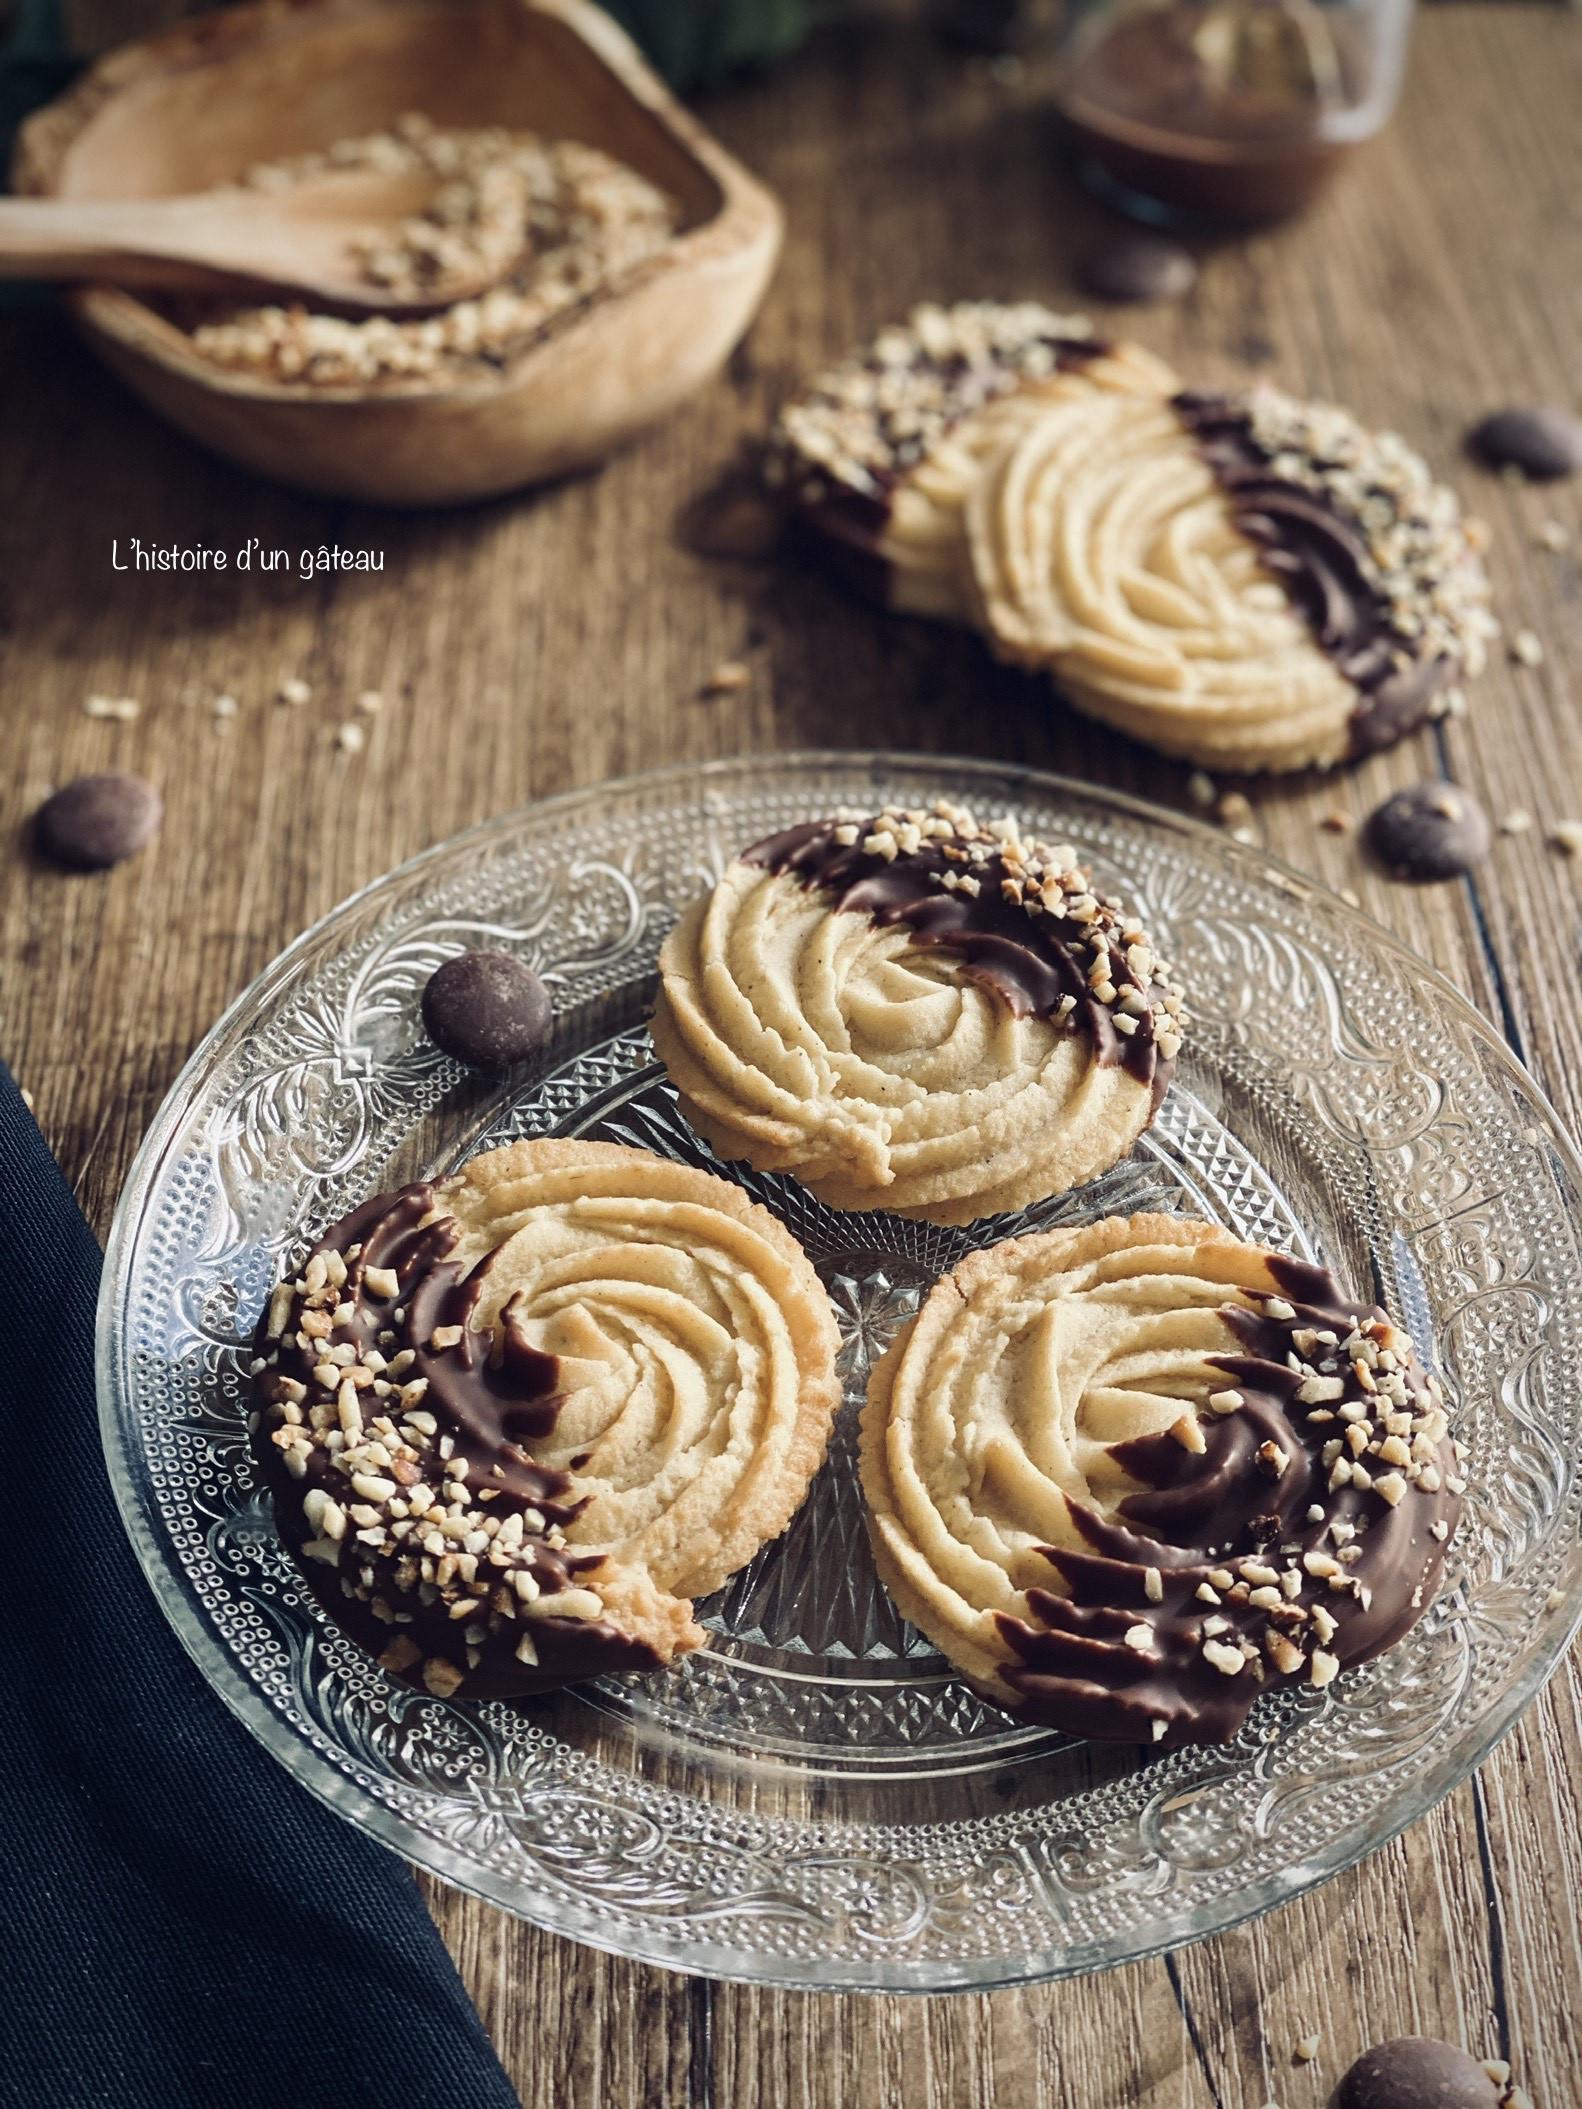 BAR of Pure Dark Chocolate 73% Papua New Guinea 100g